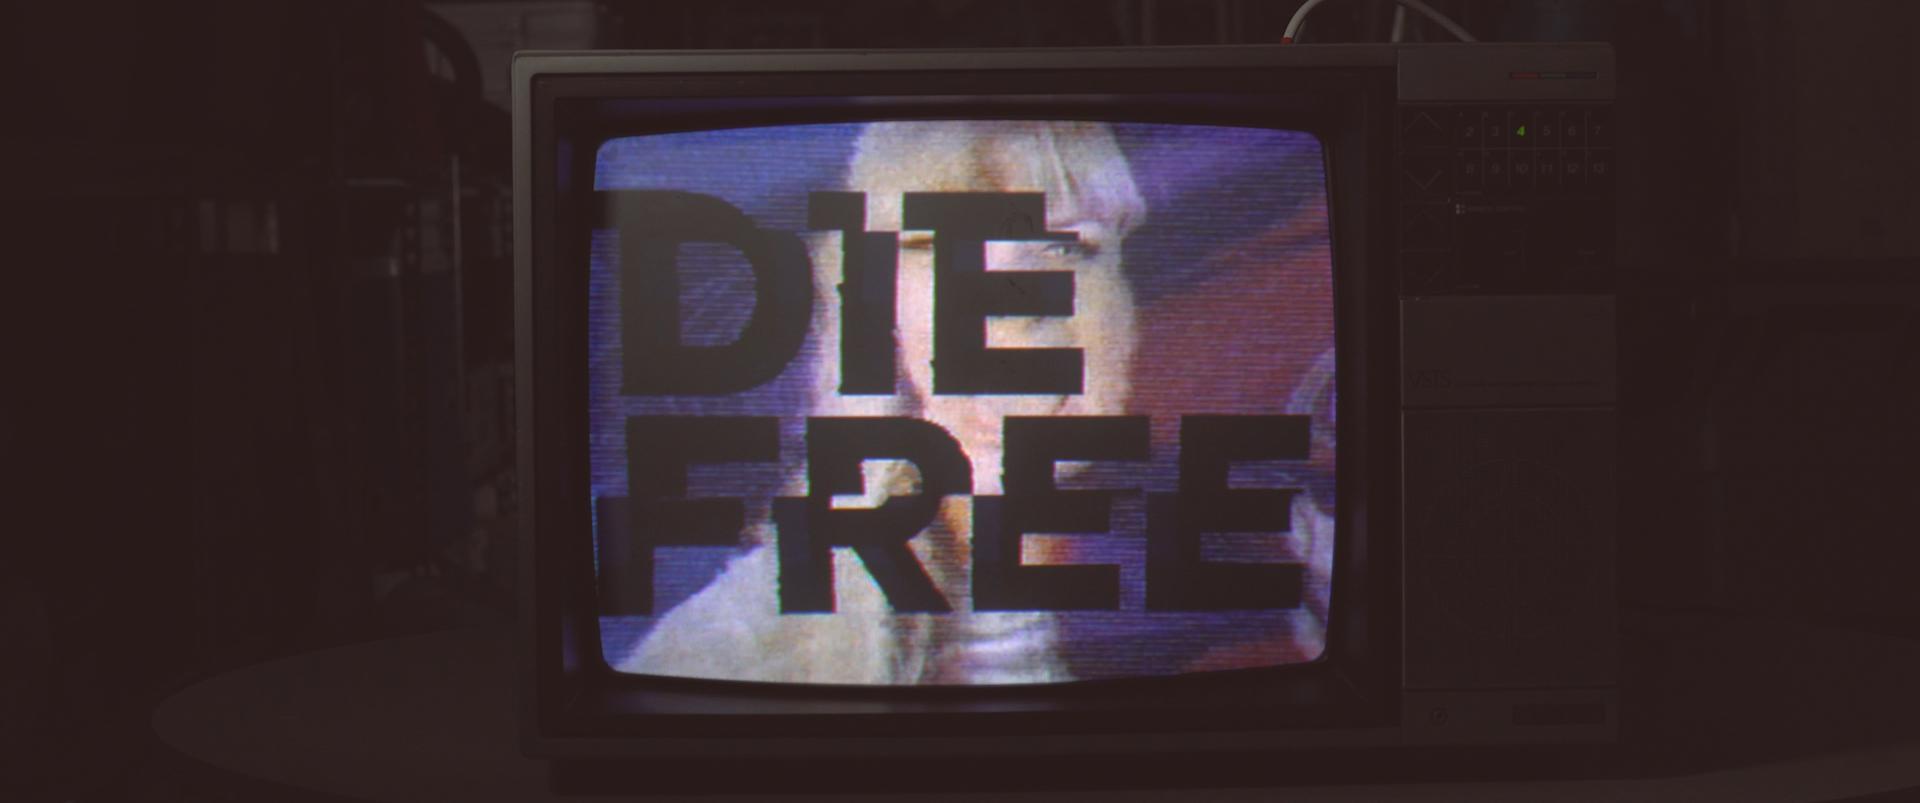 Fireflight Die Free Film.00_01_03_02.Still004.png